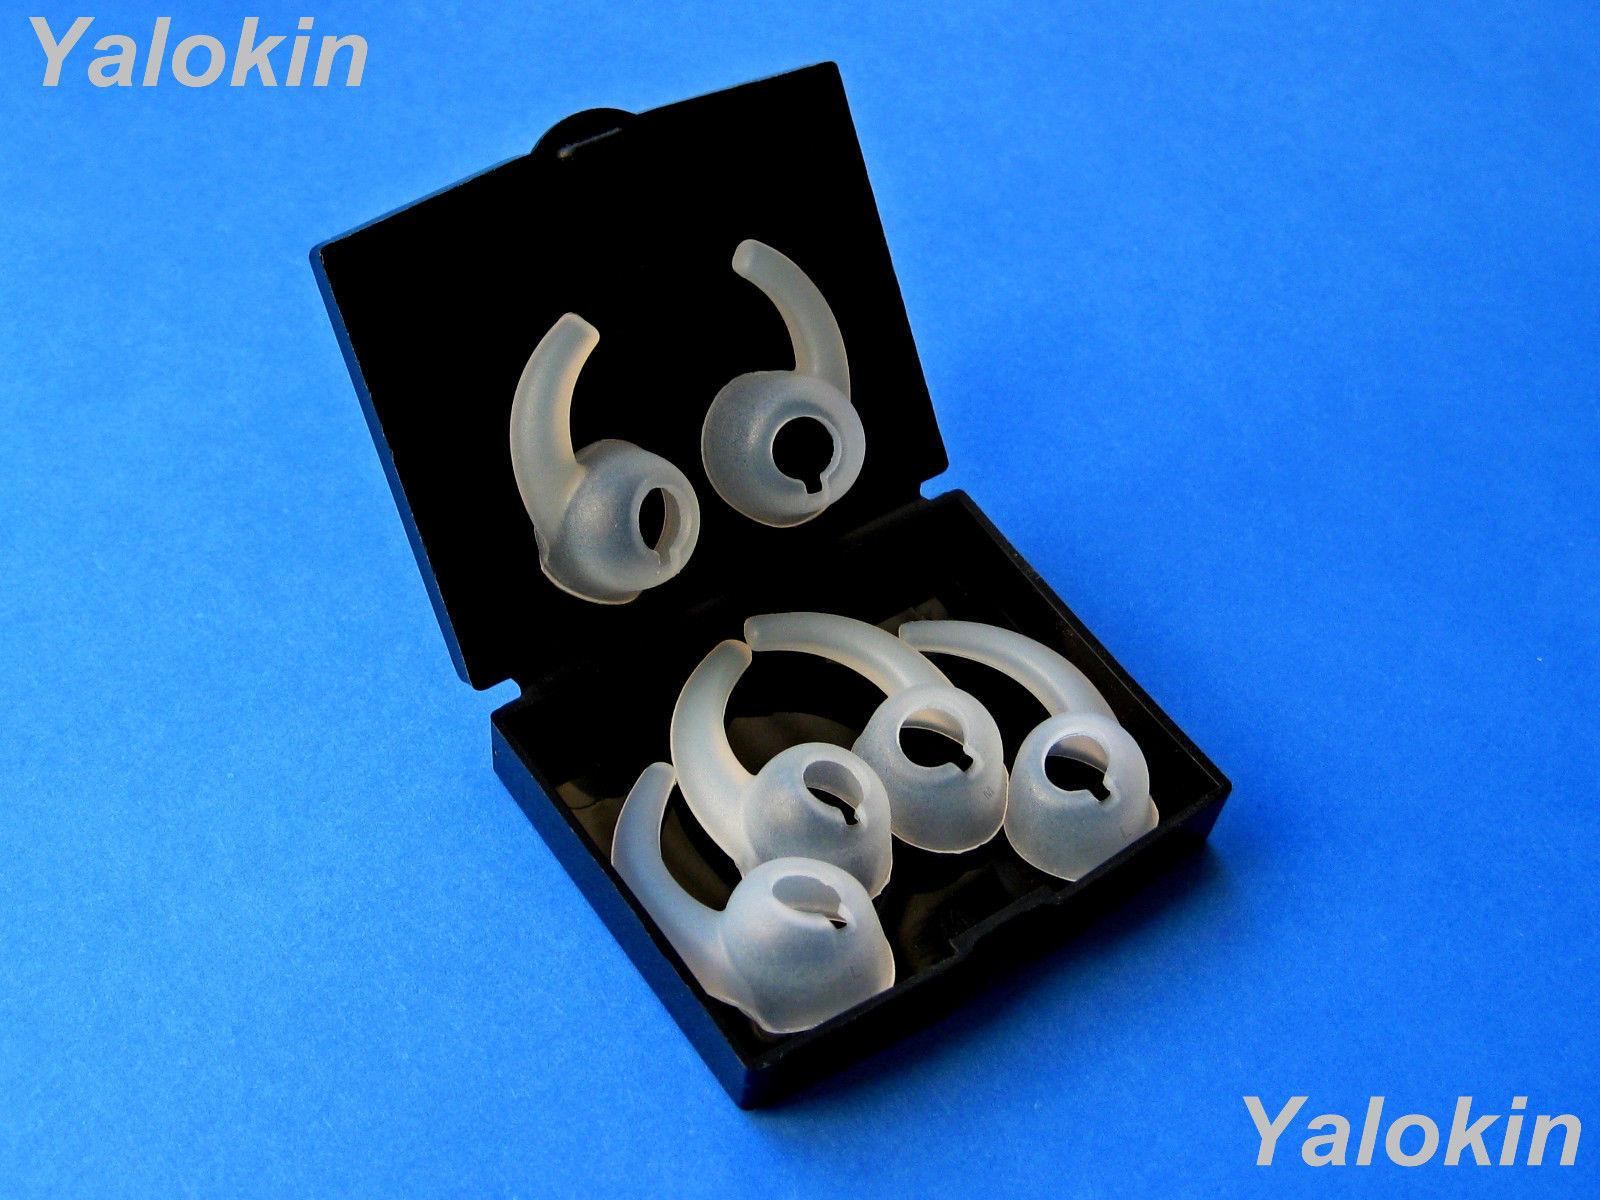 6pcs: 3 Pairs S/M/L (L+R) Ear Stabilizers Secure Wing tips for Tour 2 Earphones